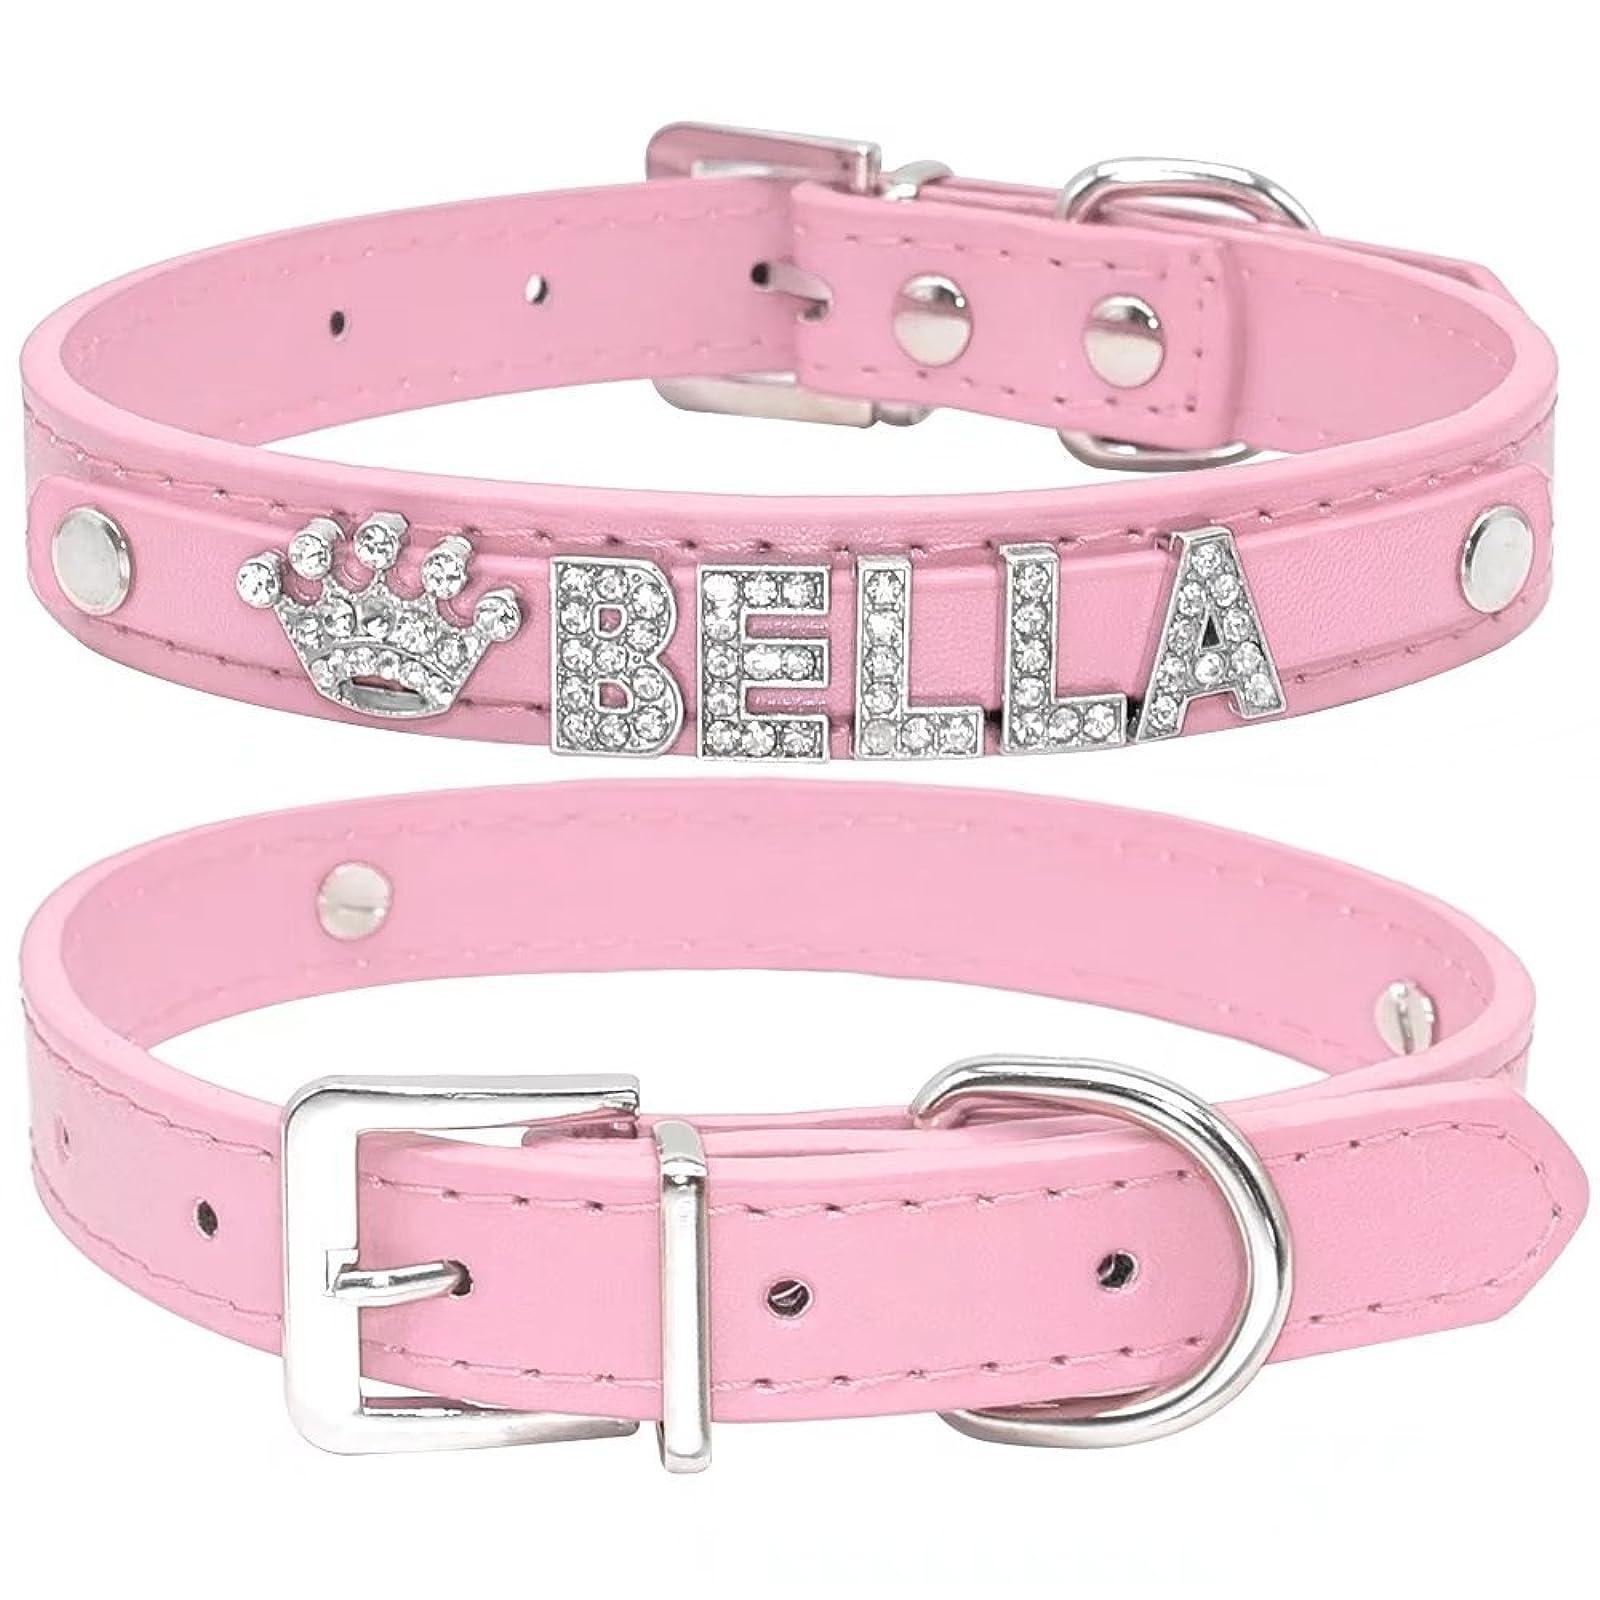 Didog Smooth PU Leather Custom Dog Collars - 6